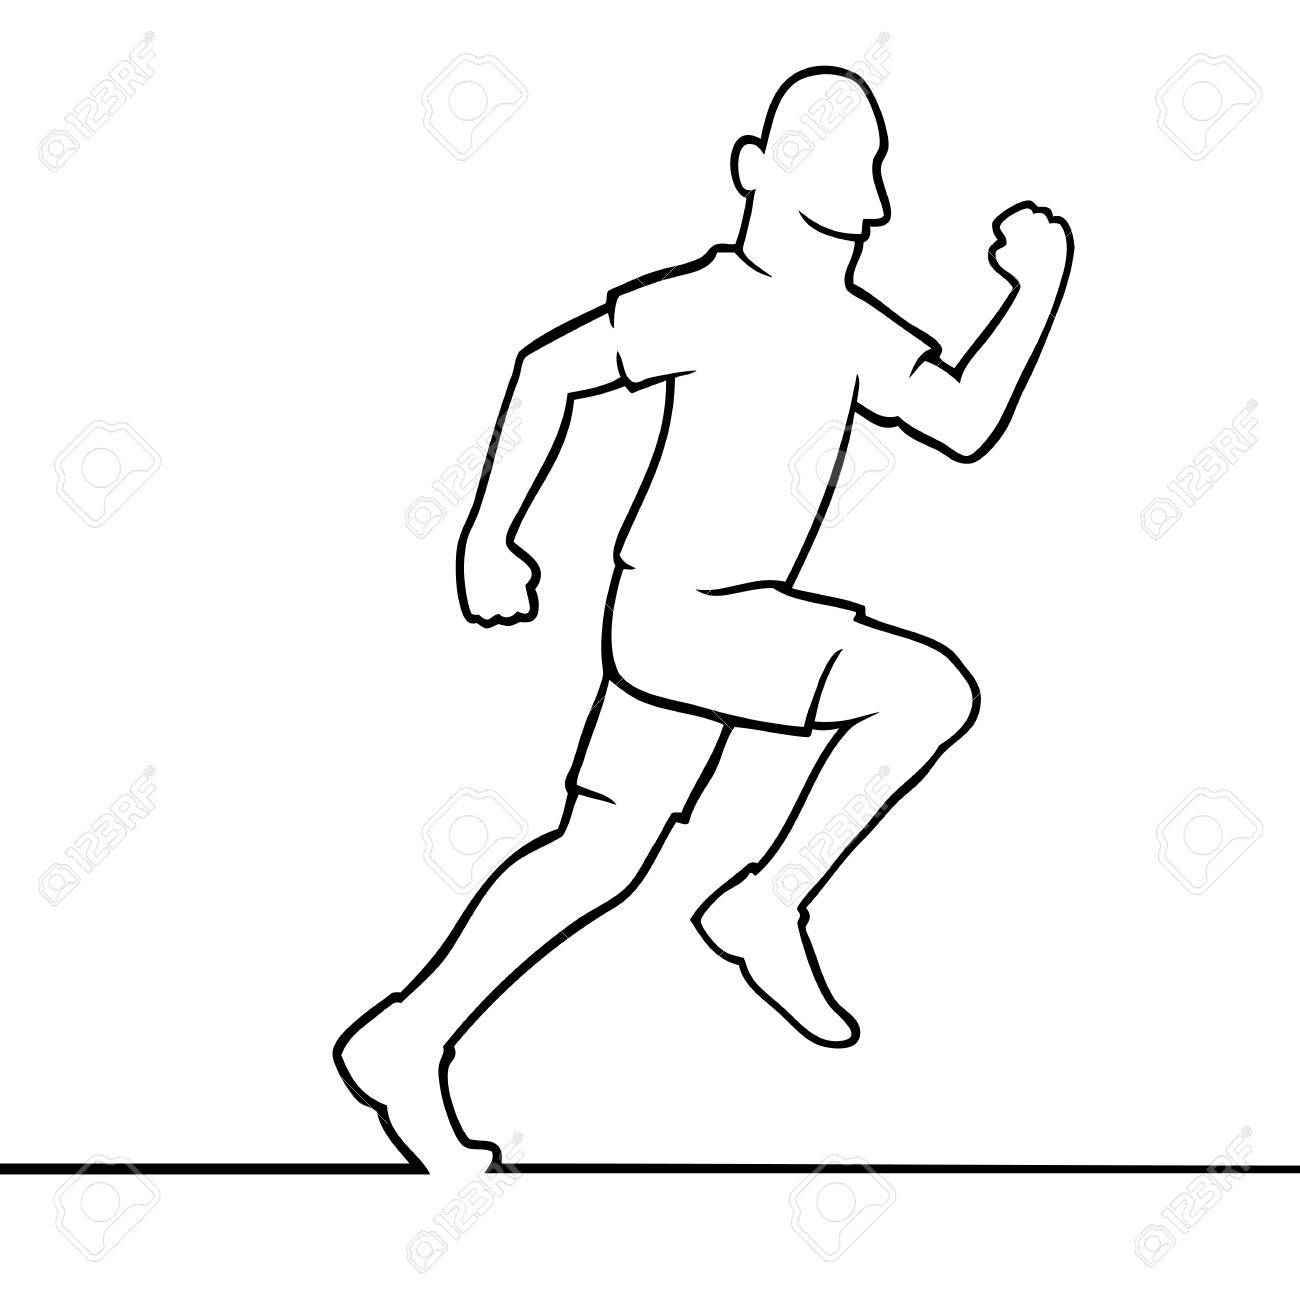 1300x1300 Black Line Art Illustration Of A Running Athlete Royalty Free